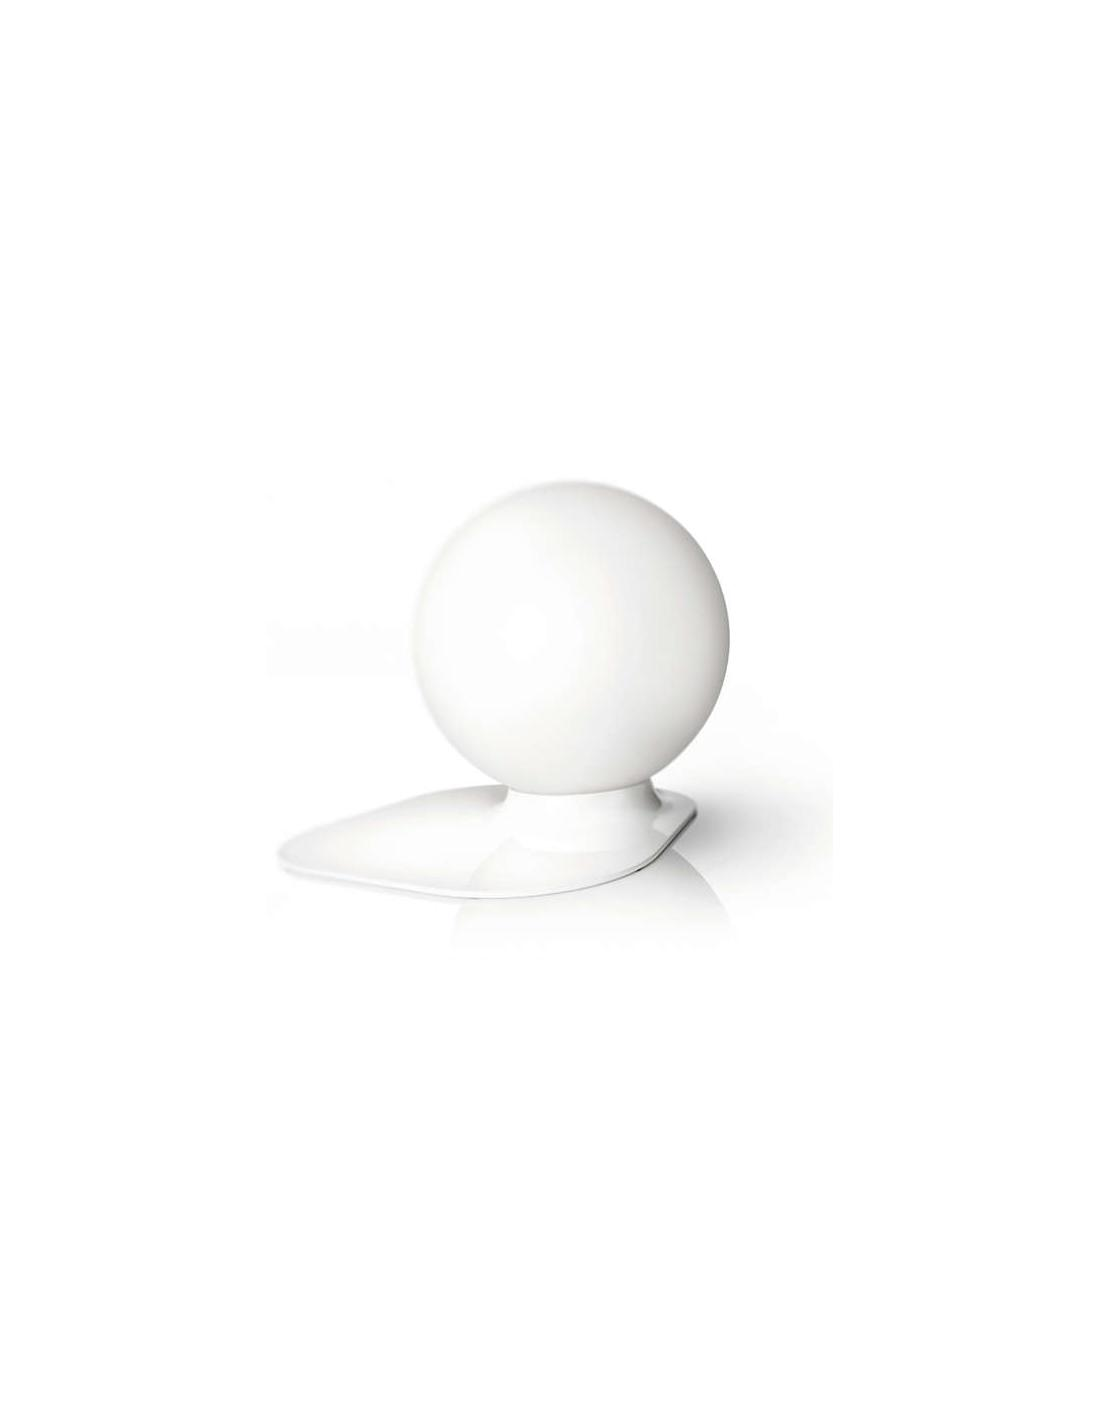 Philips 432113116 Lampada Da Tavolo Base Bianca Palla Vetro